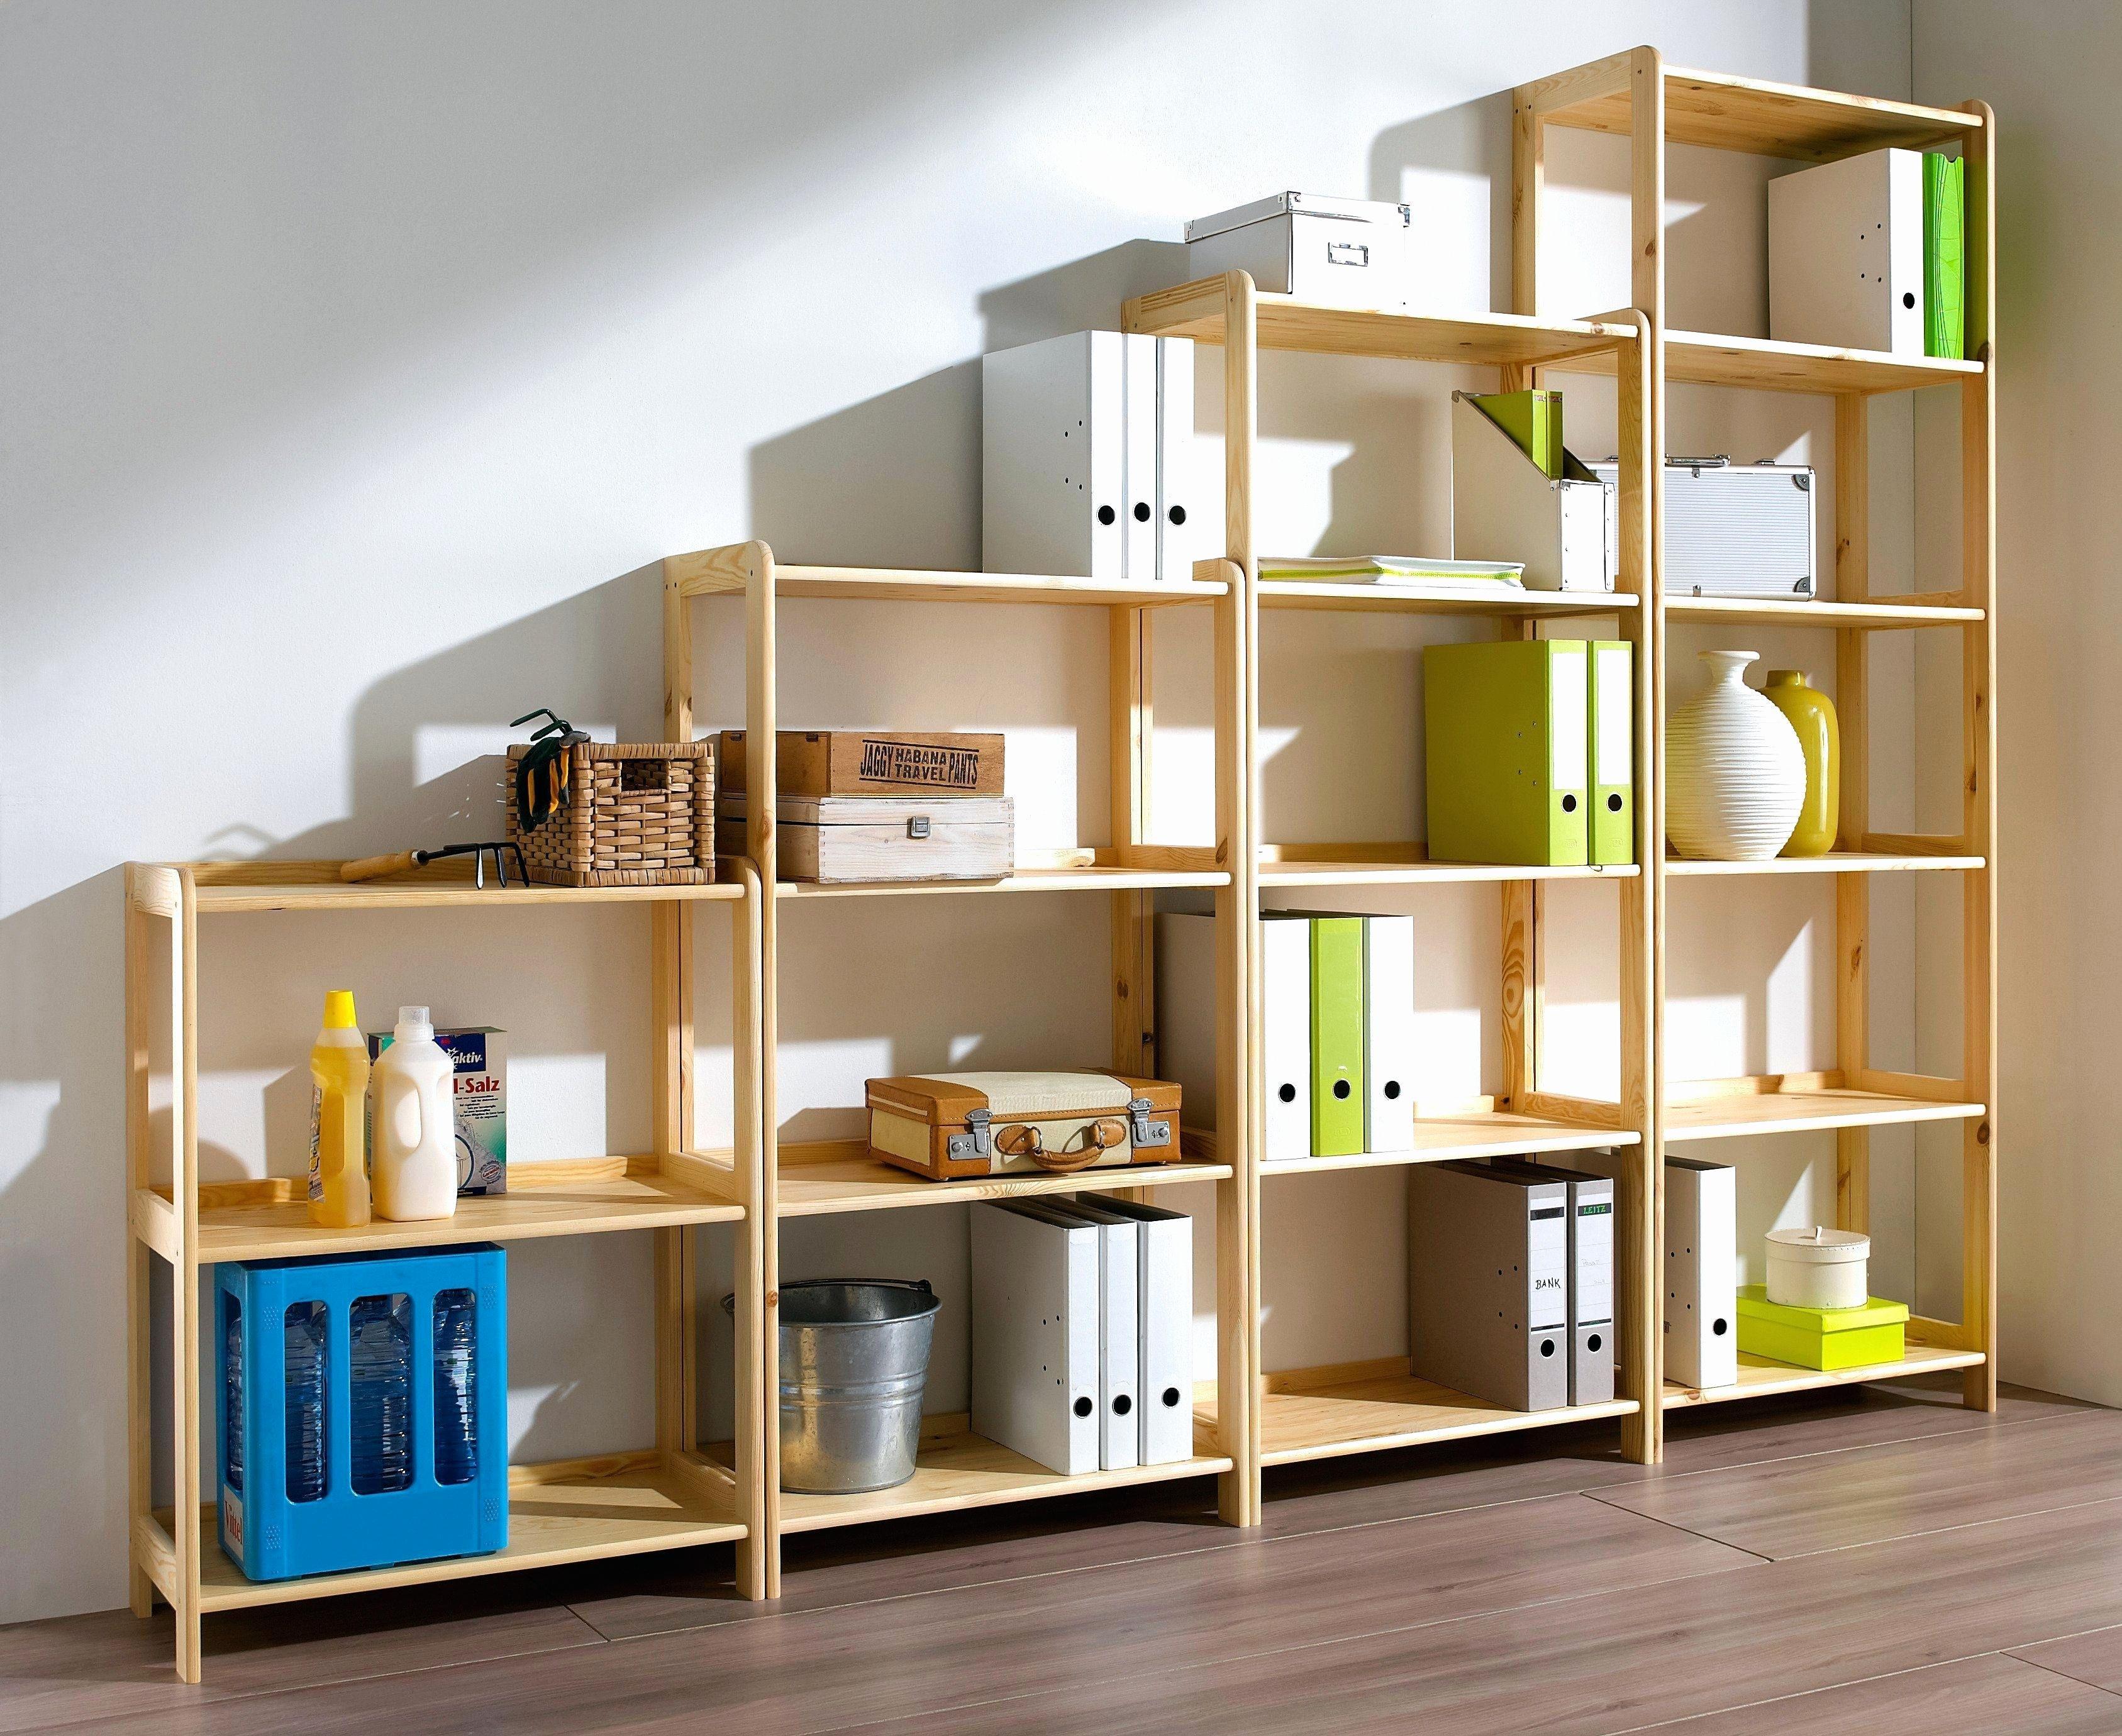 44 Wunderschon Badezimmer Aufbewahrung Bauhaus Fur Ein Besseres Haus Home Decor Shelves Wooden Shelves